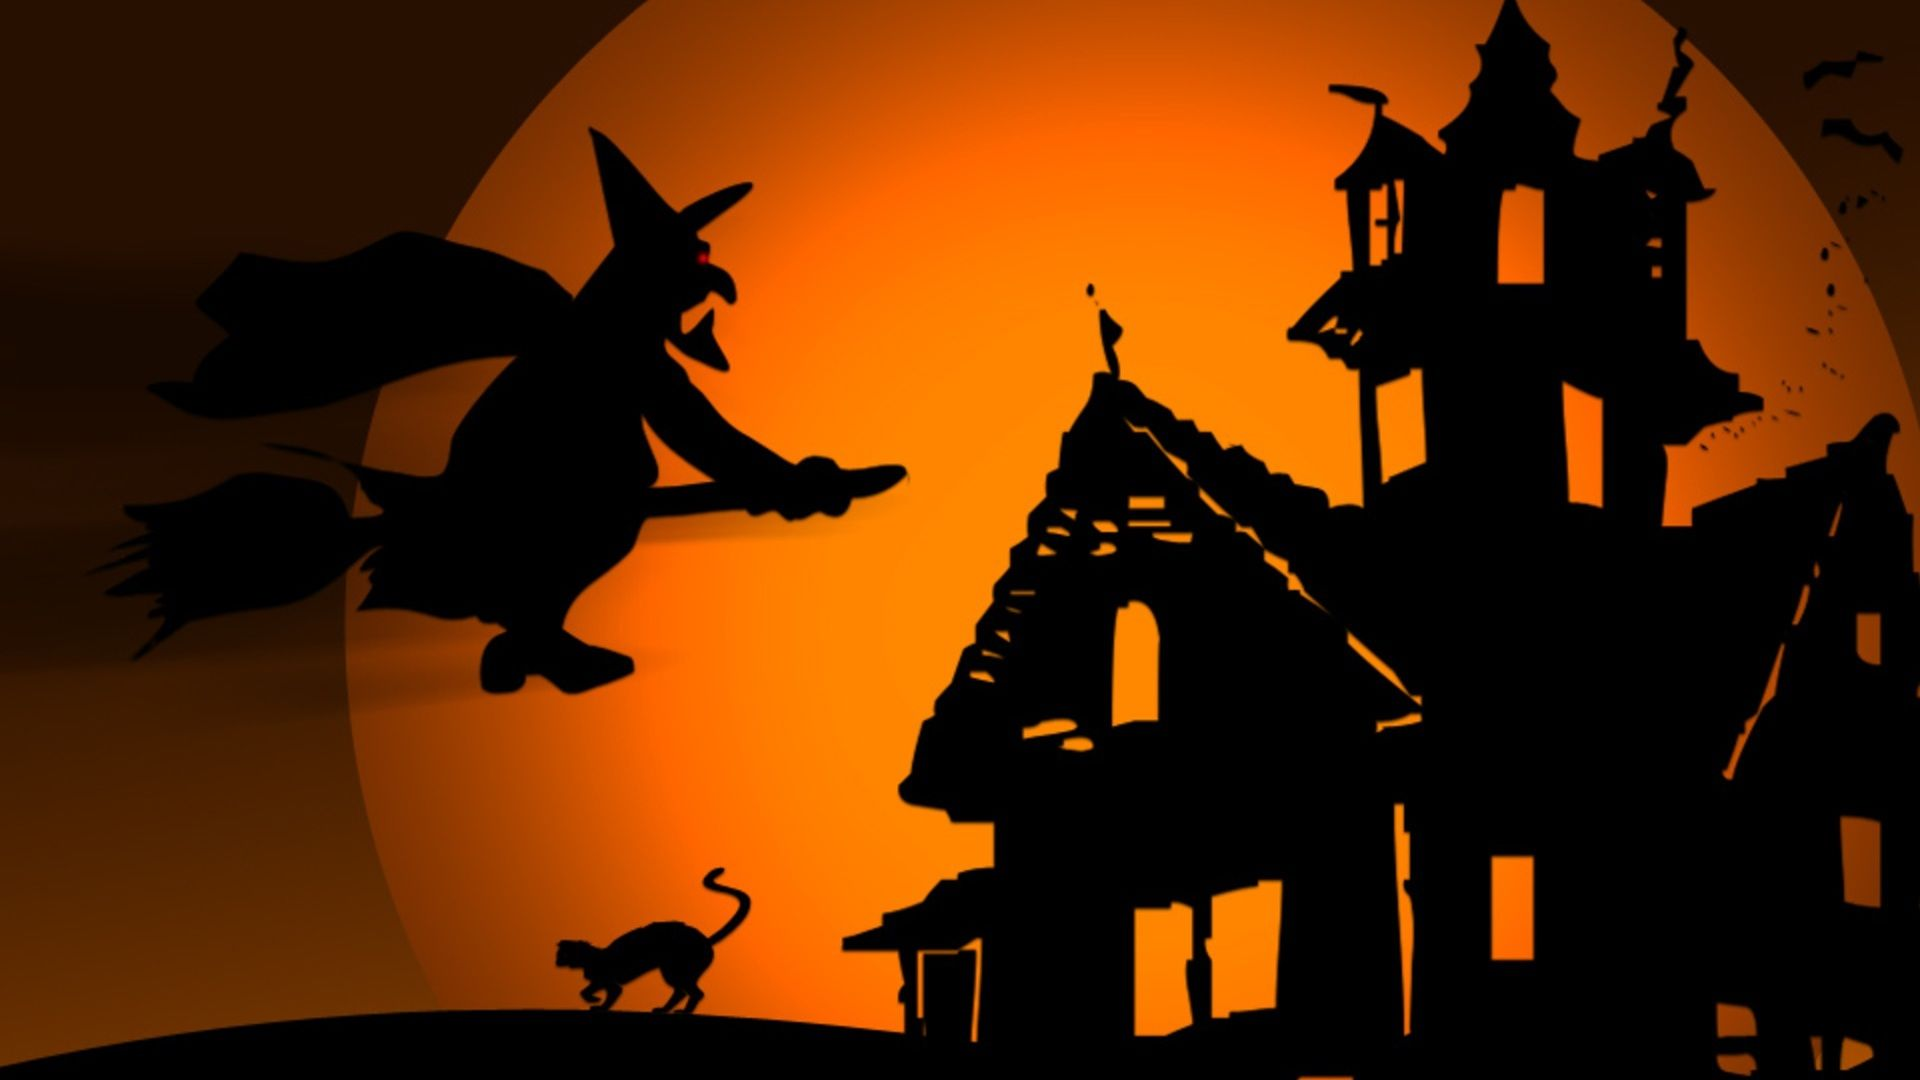 Download Wallpaper Halloween Pinterest - 1f0cadba2dfbd00cba5205c93486b427  Gallery_585819.jpg